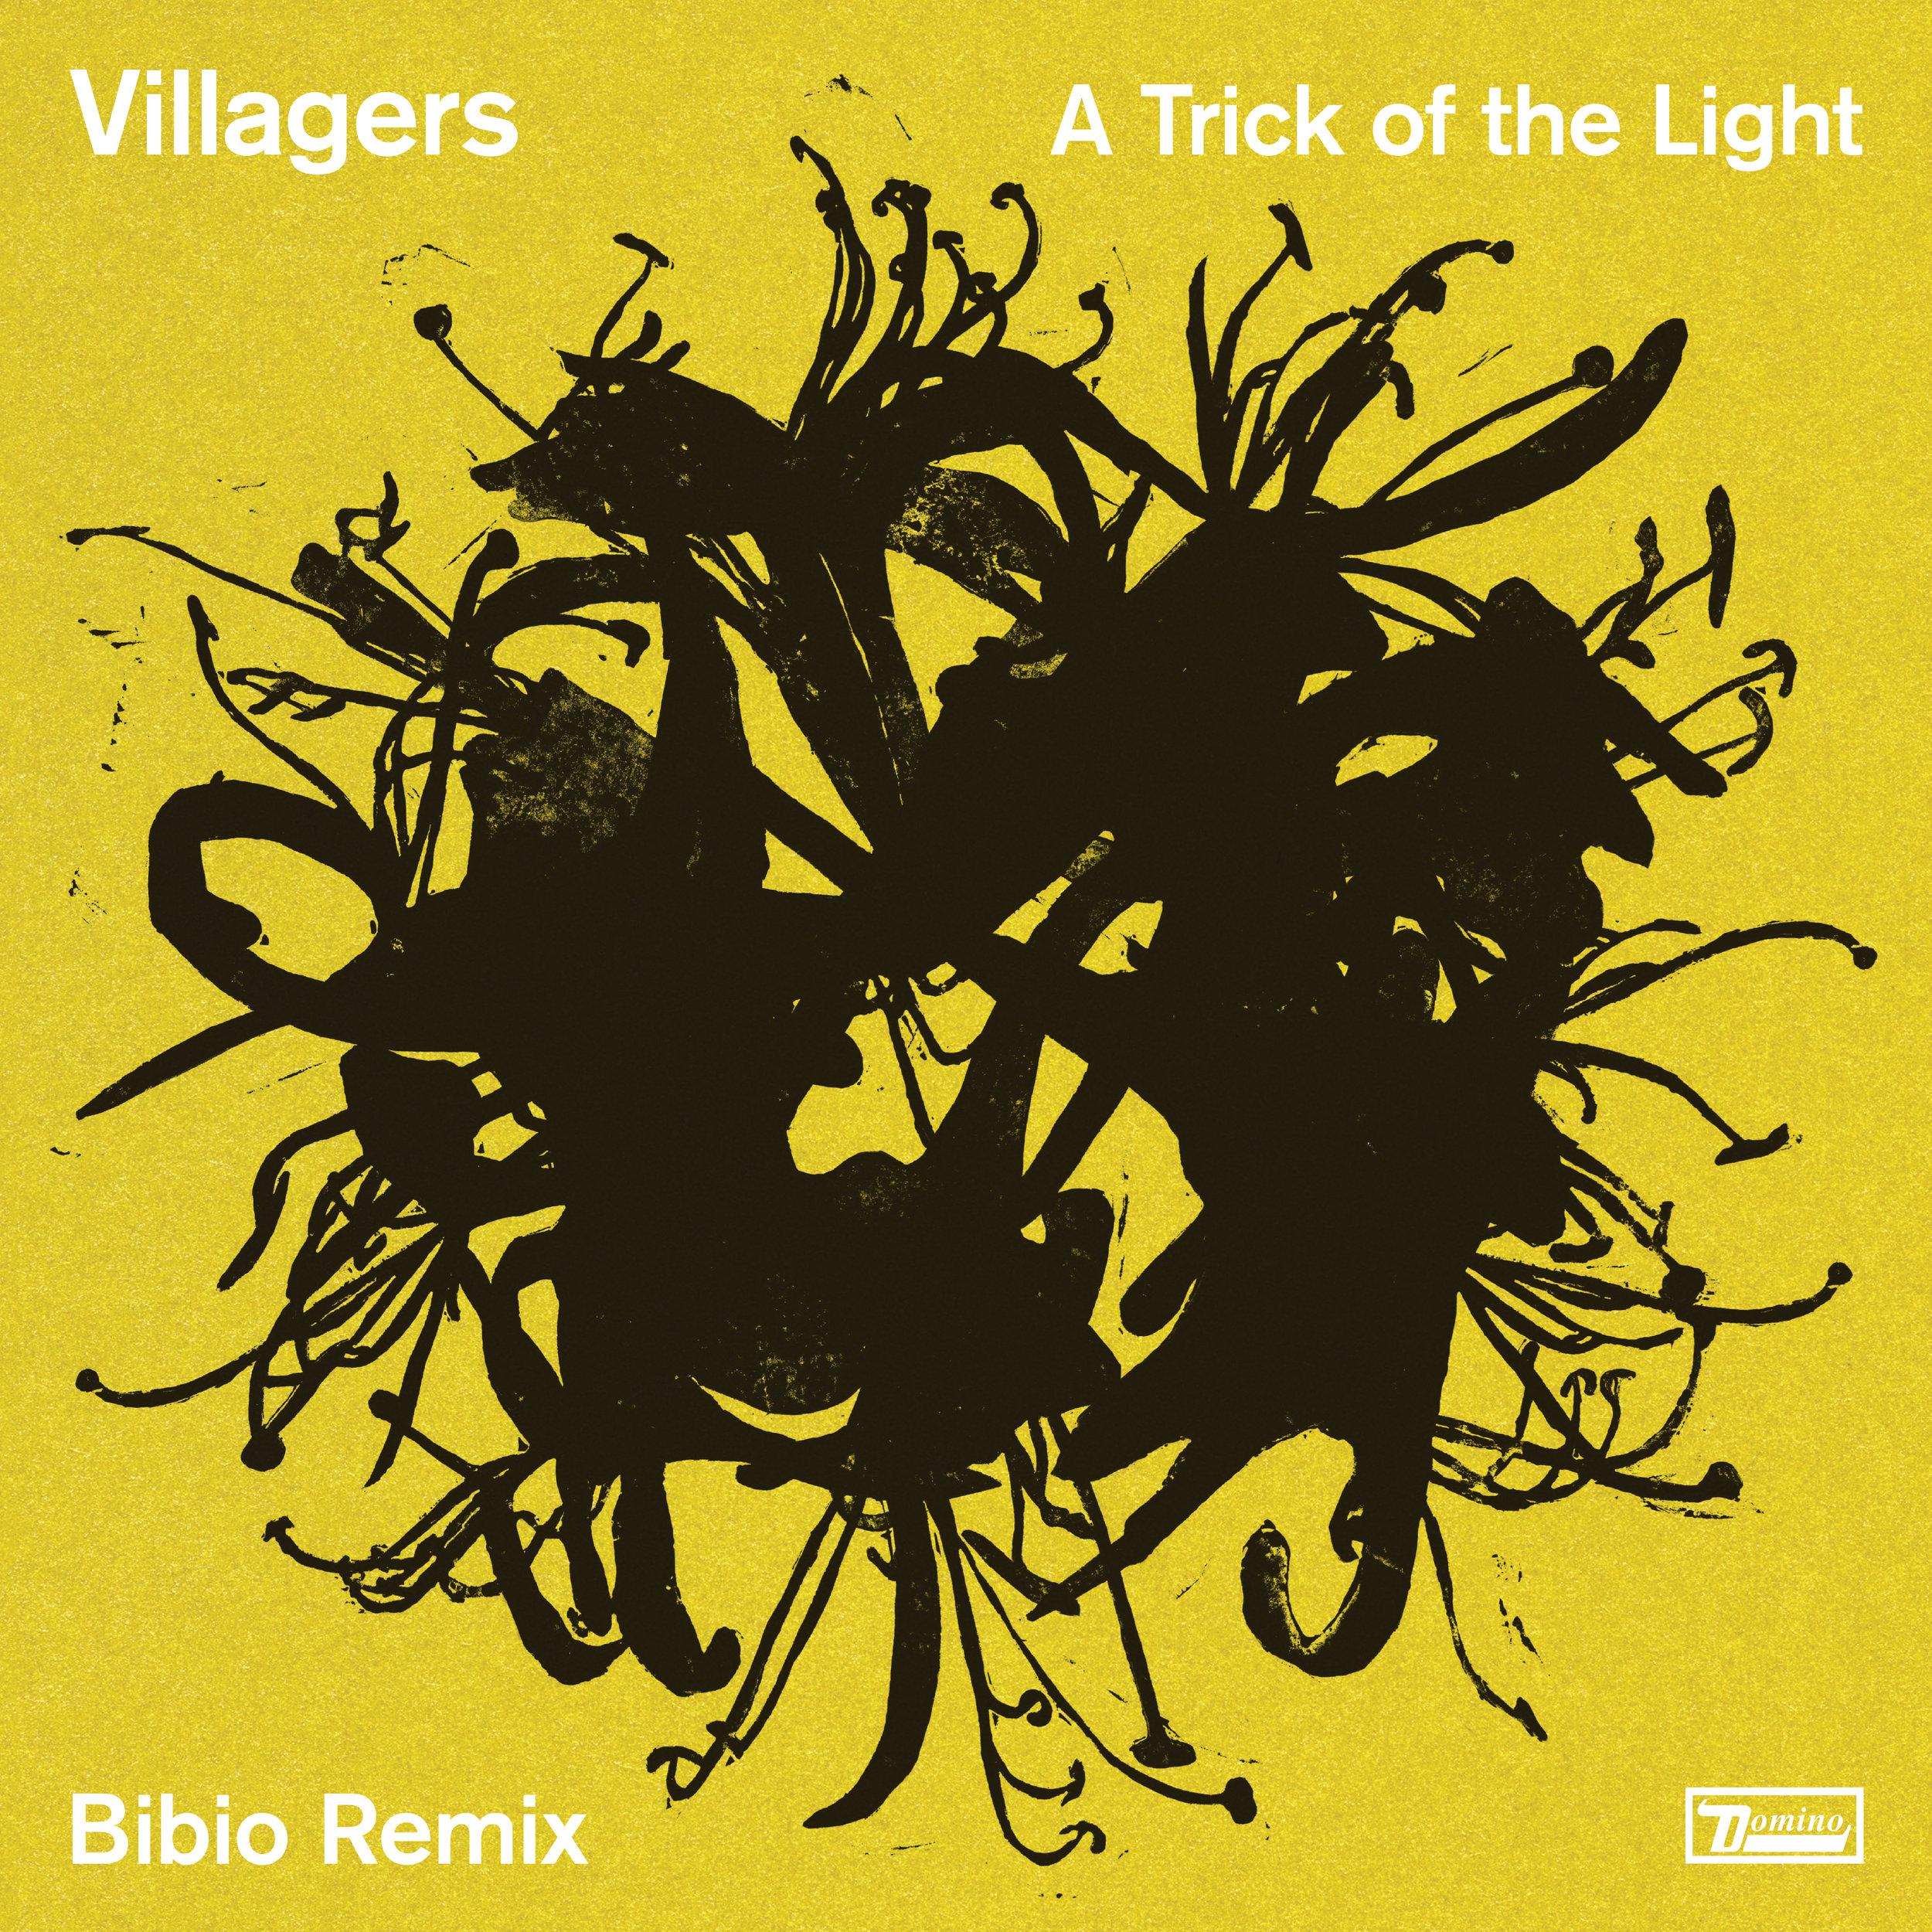 ATrickoftheLight_Bibio Remix 3000.jpg